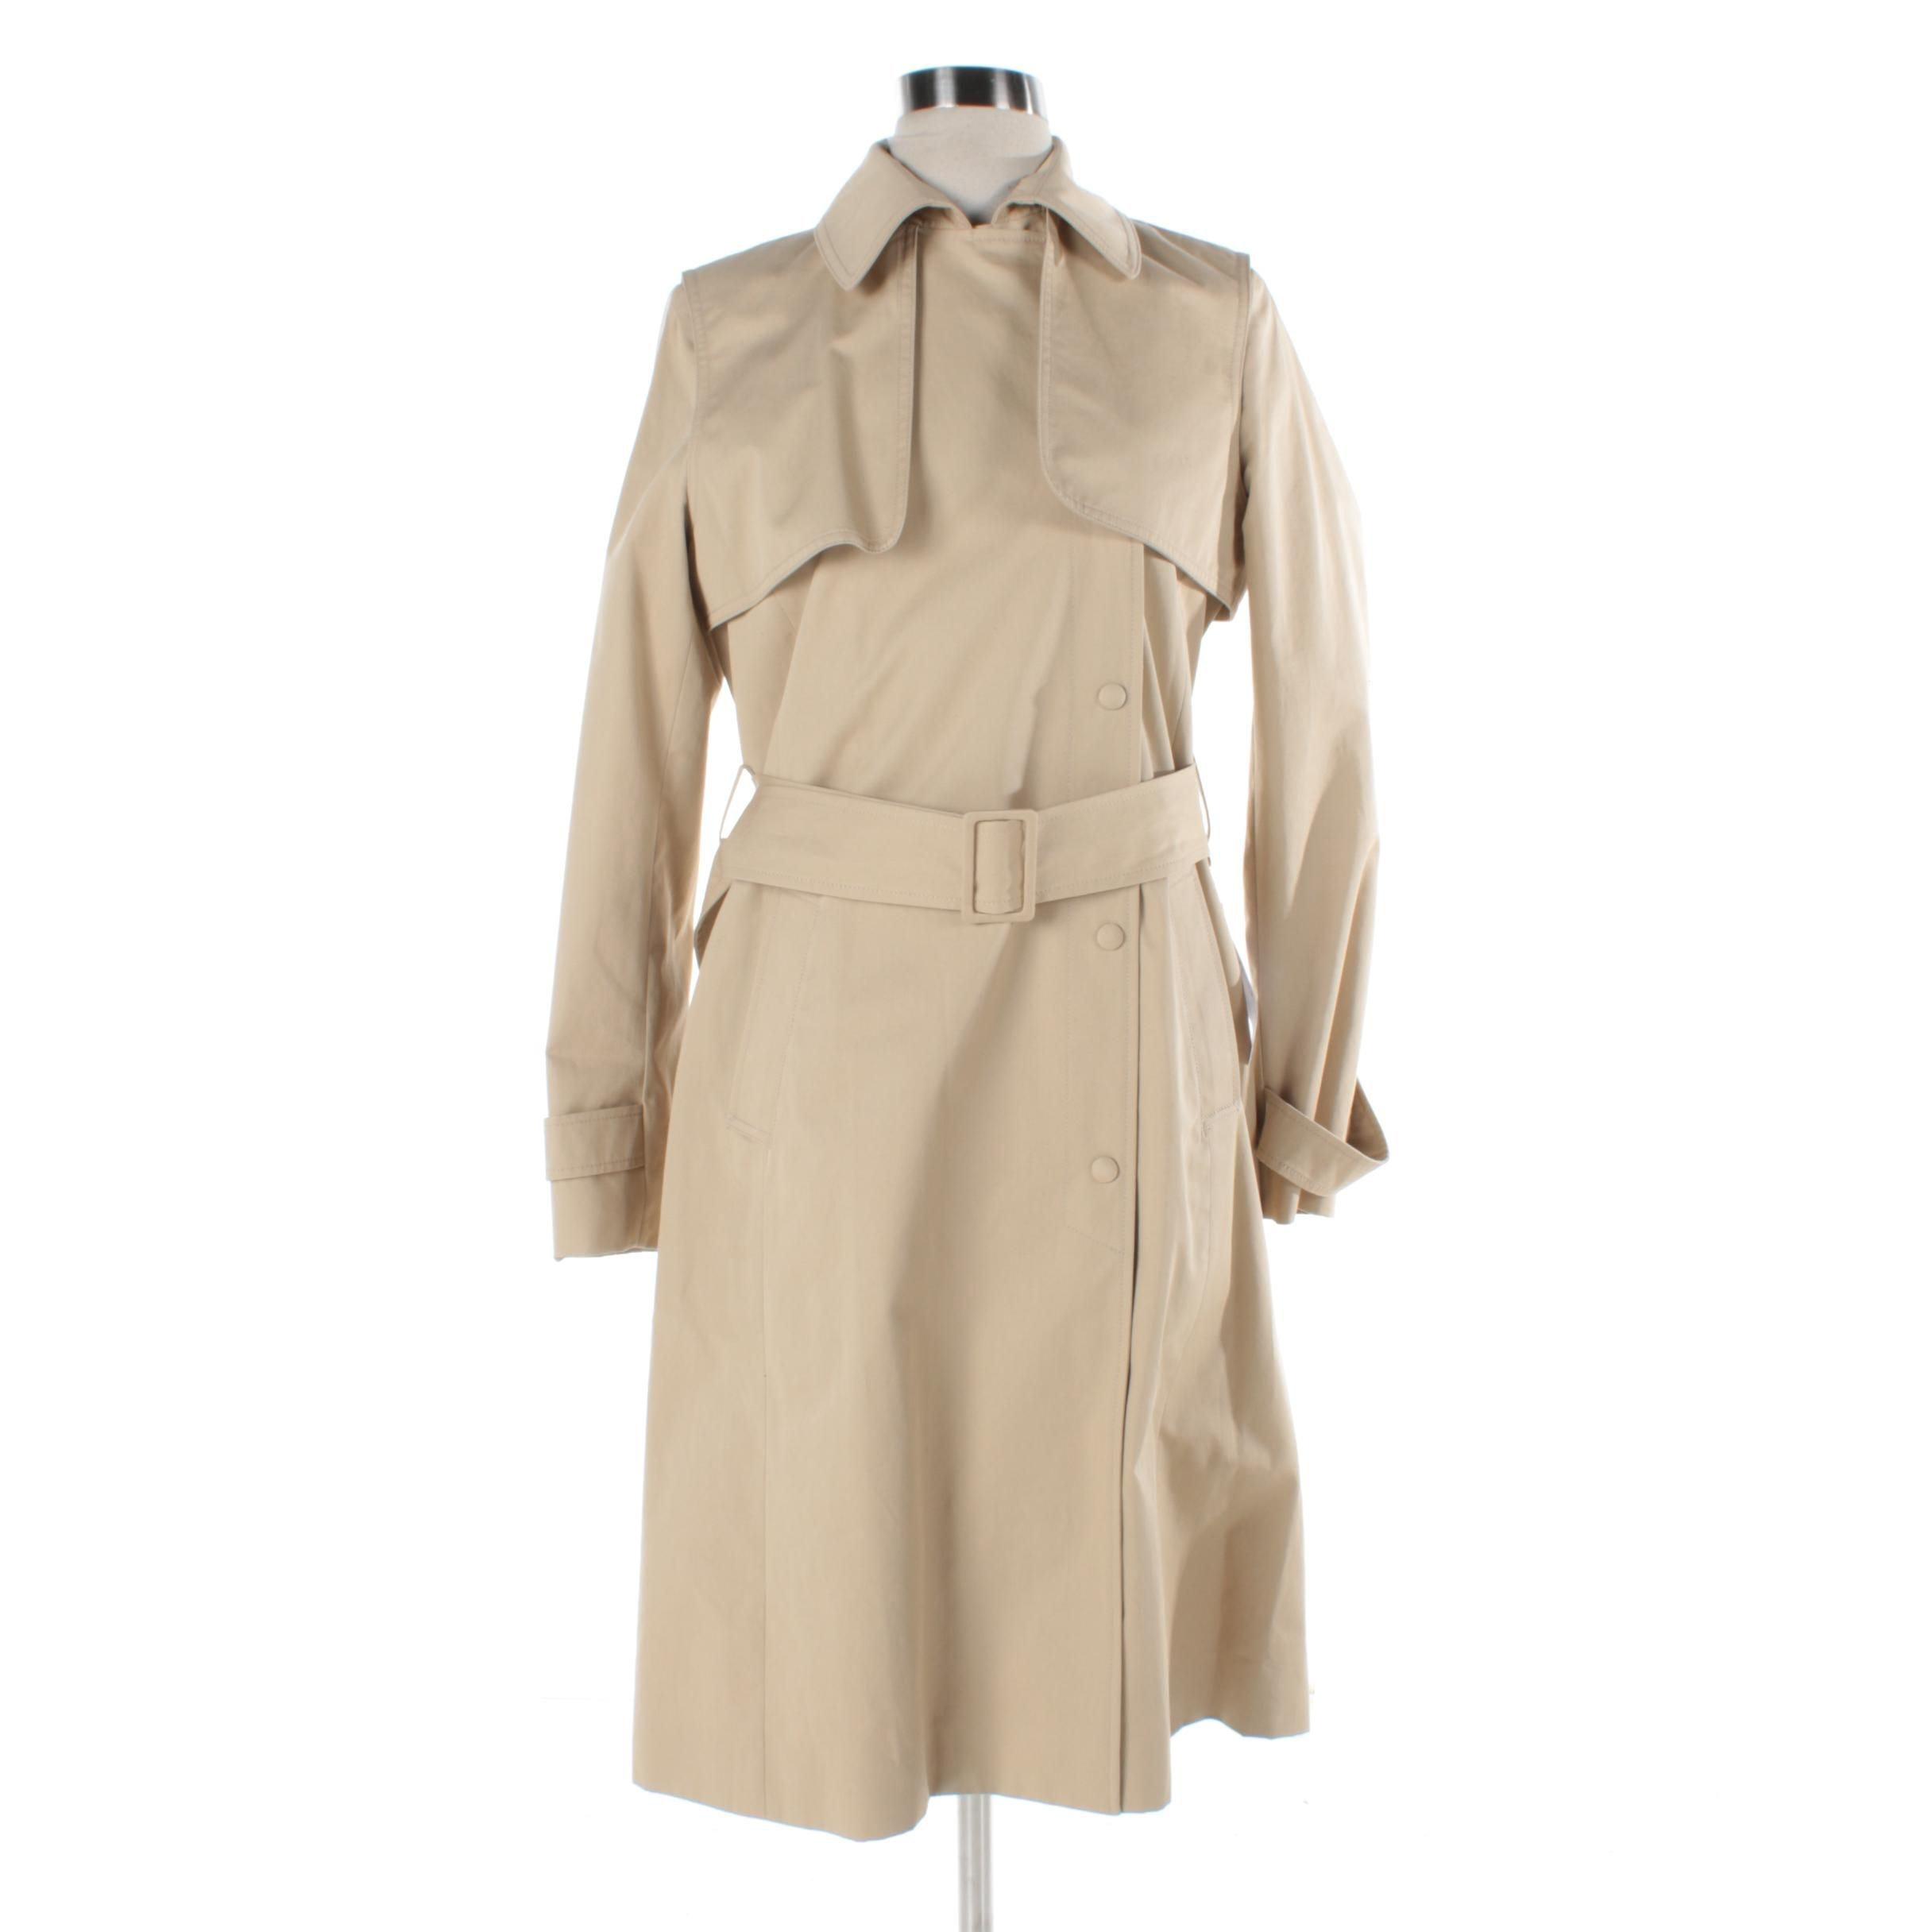 Women's Lacoste Beige Trench Coat